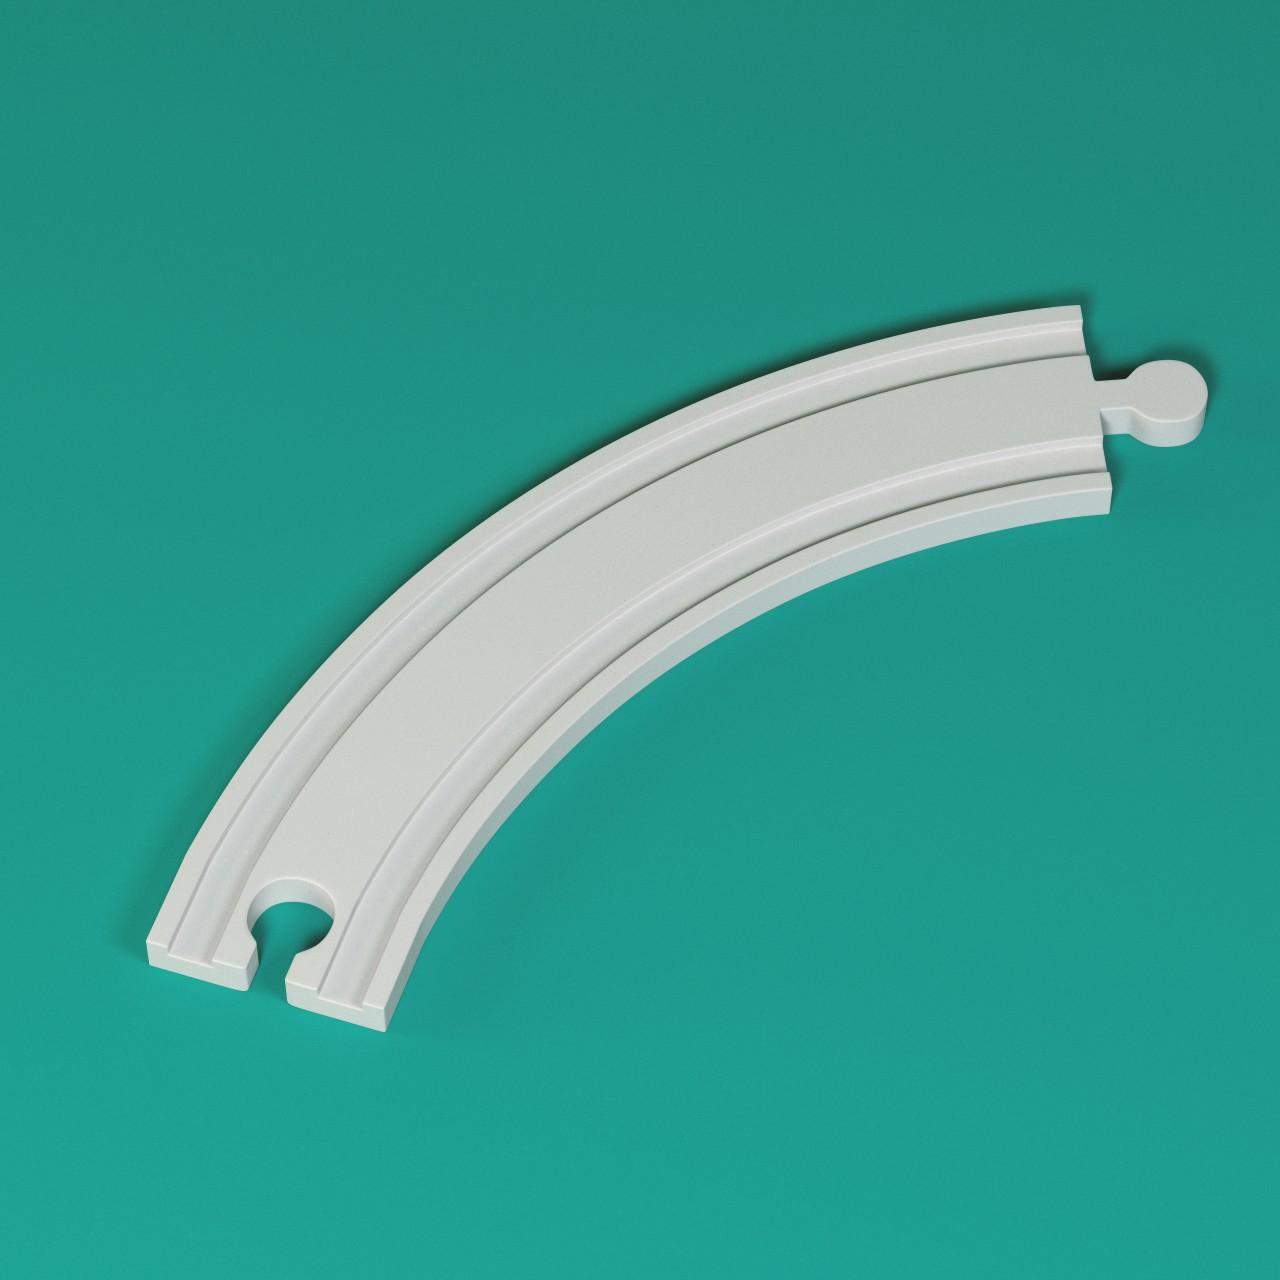 track_curved_v1_1.jpg